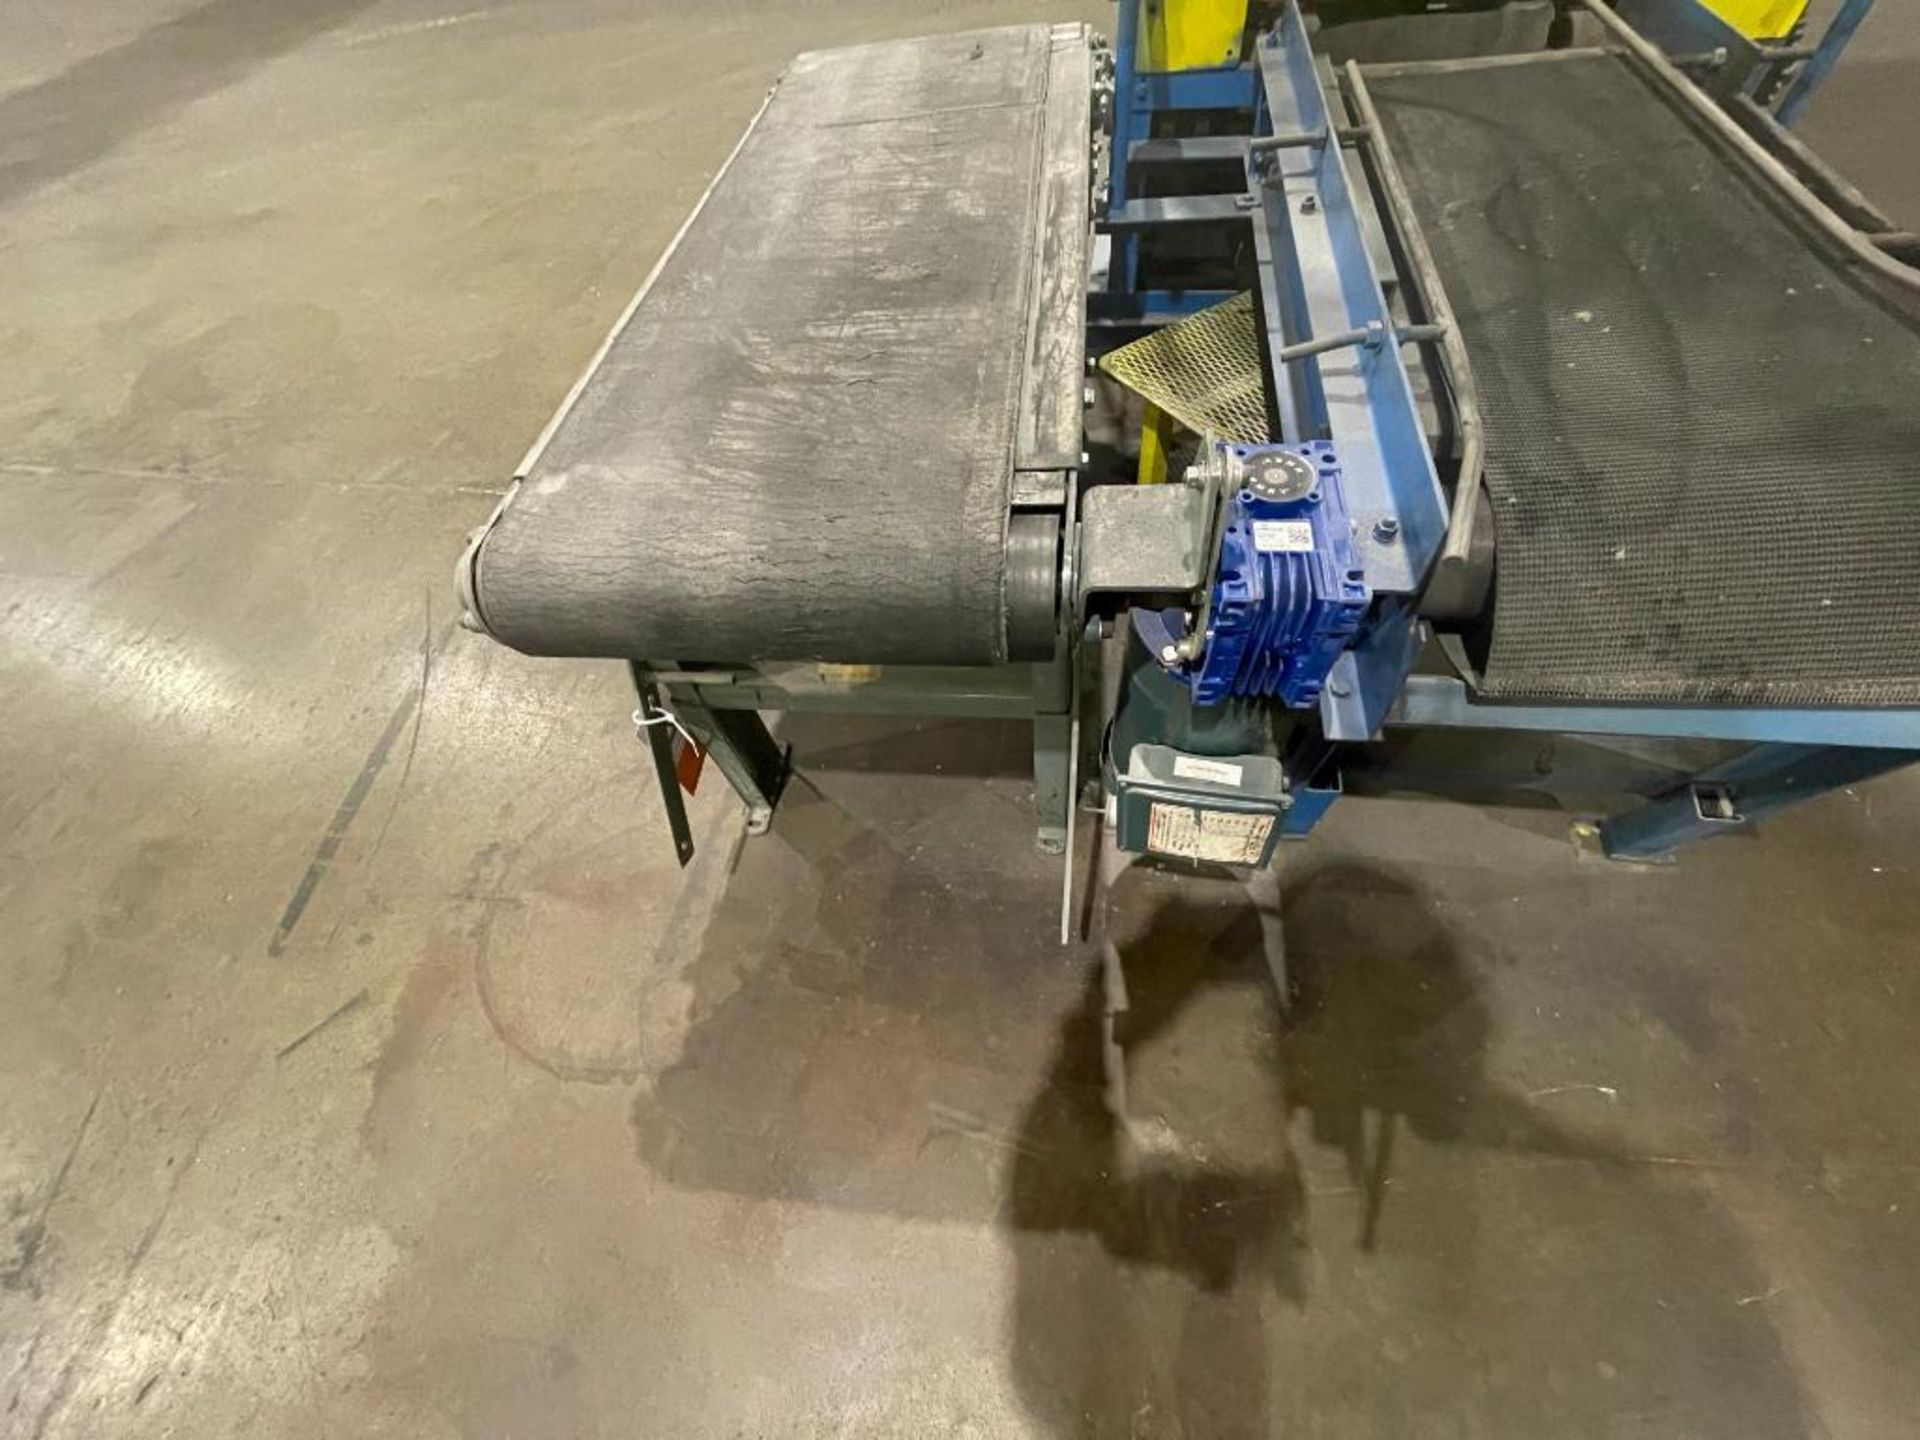 Hytrol mild steel conveyor - Image 2 of 10